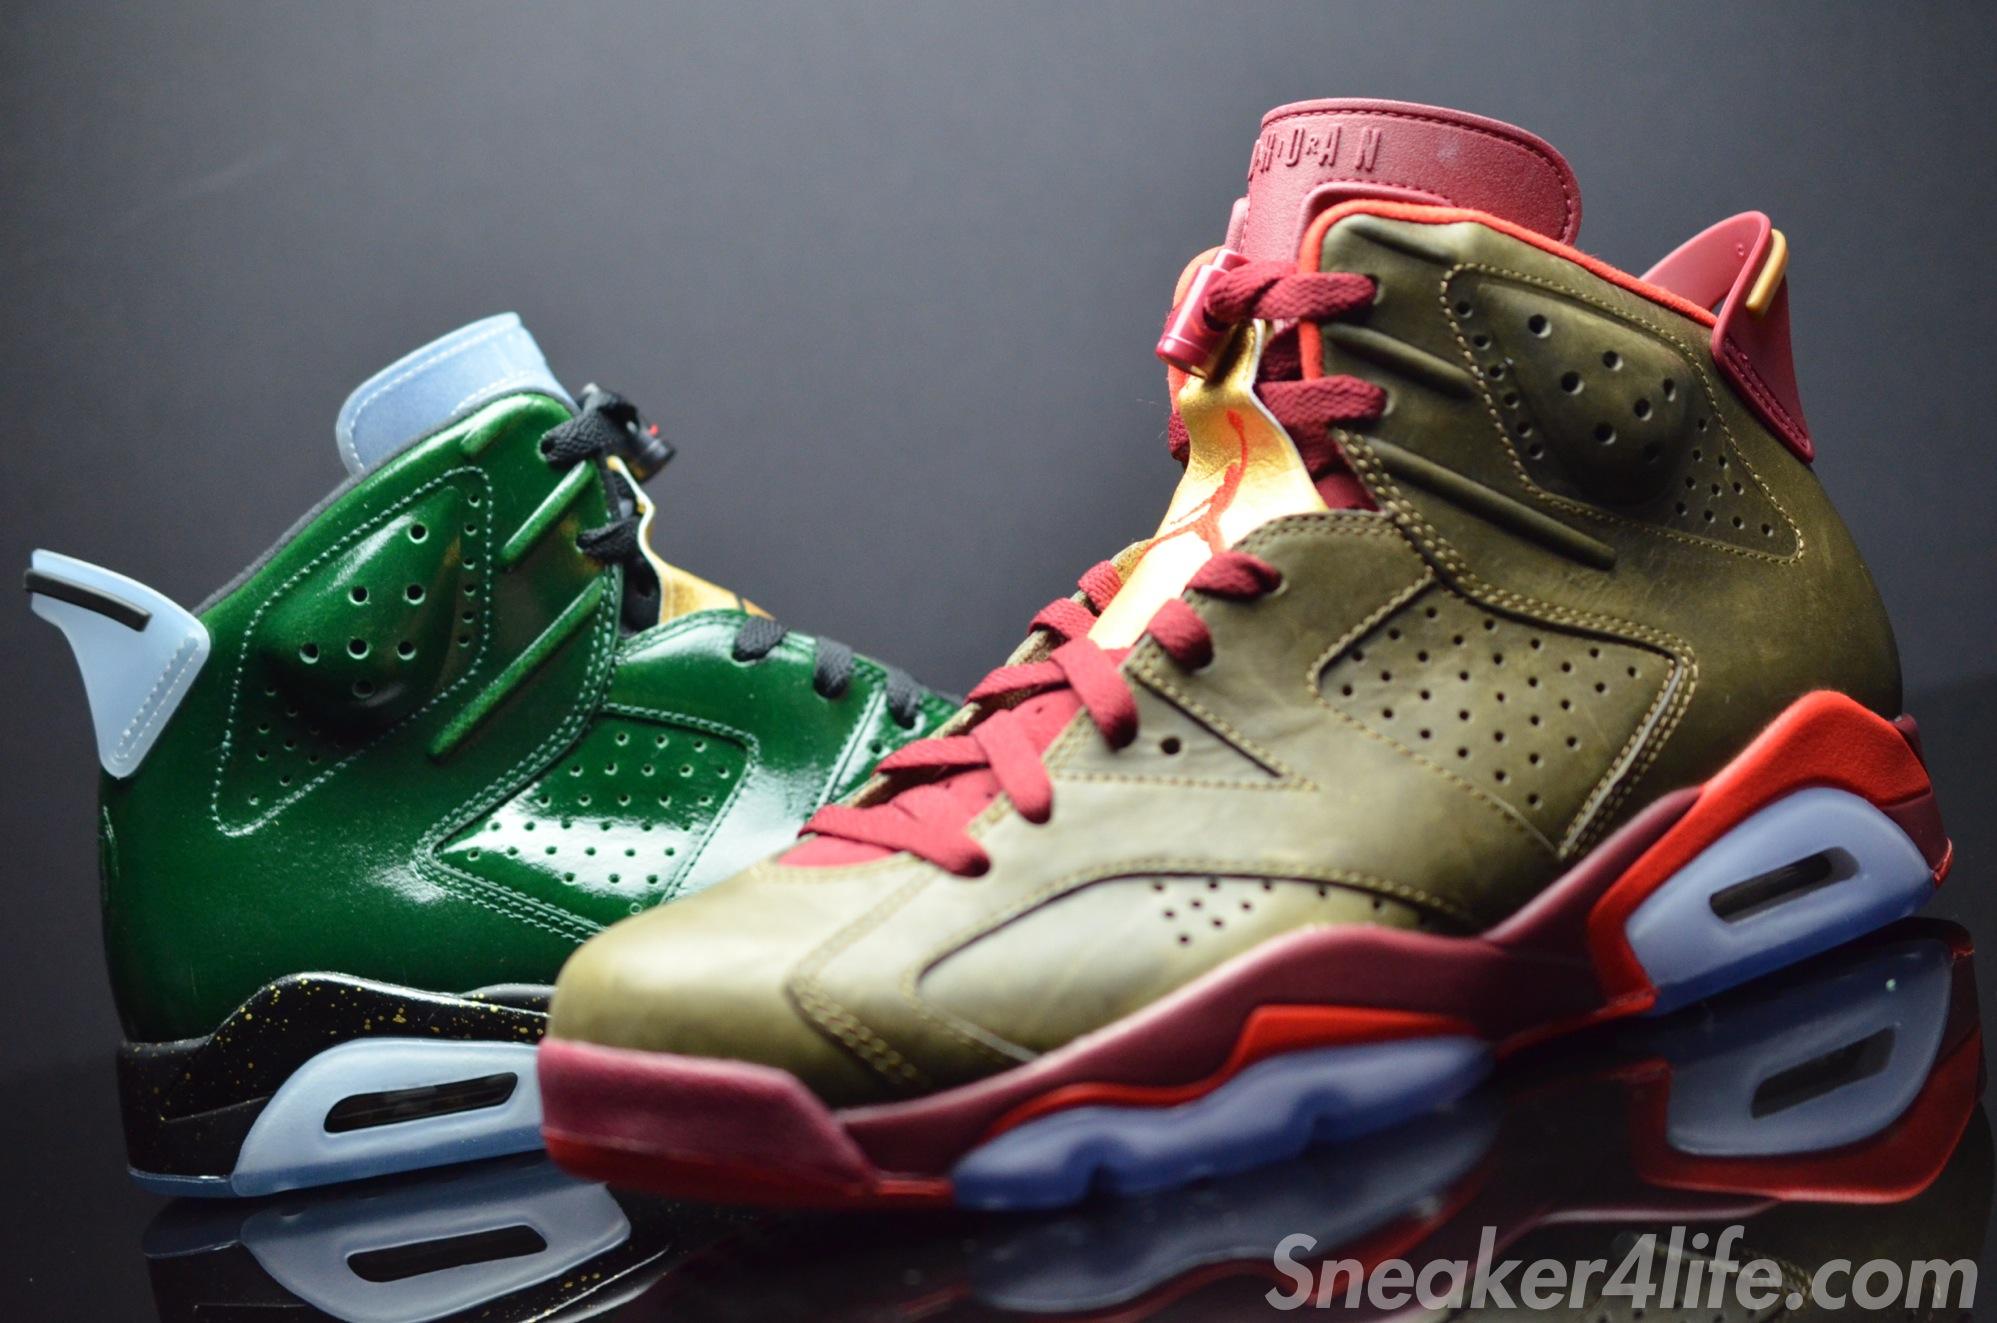 Jordans shoes release dates in Brisbane